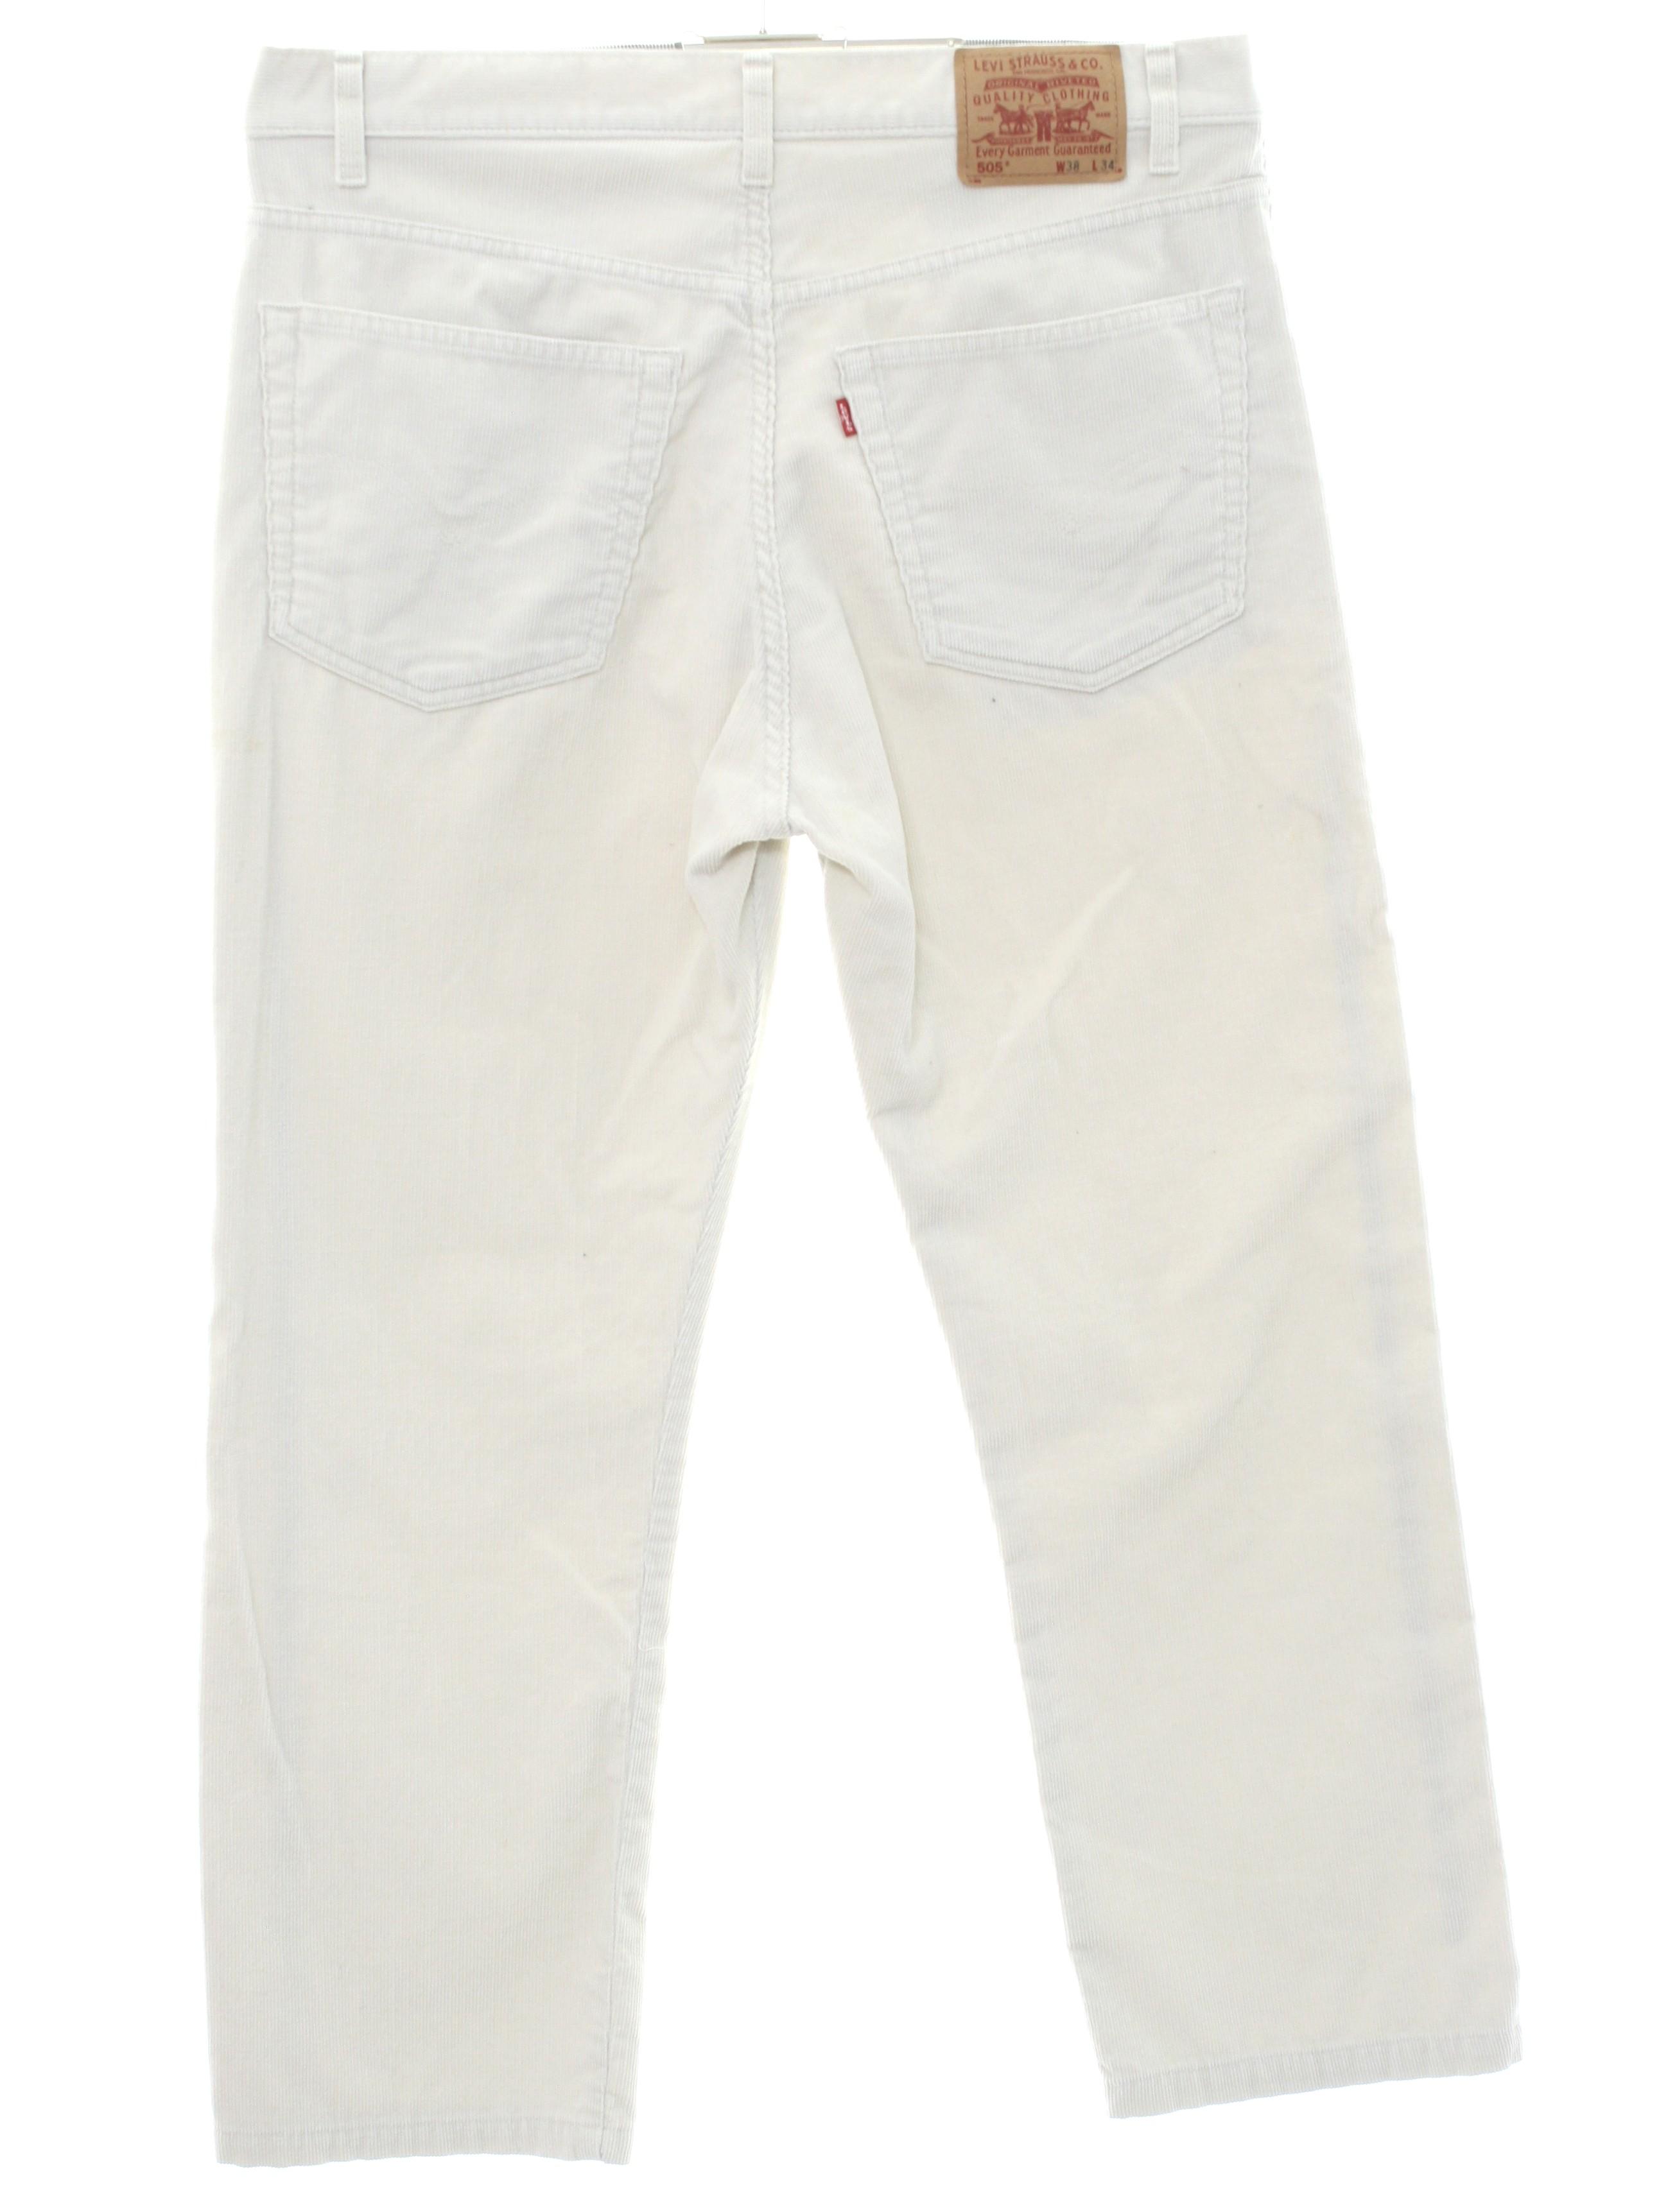 cc75c3b377 1990's Retro Pants: 90s -Levis 505- Mens off white solid colored ...